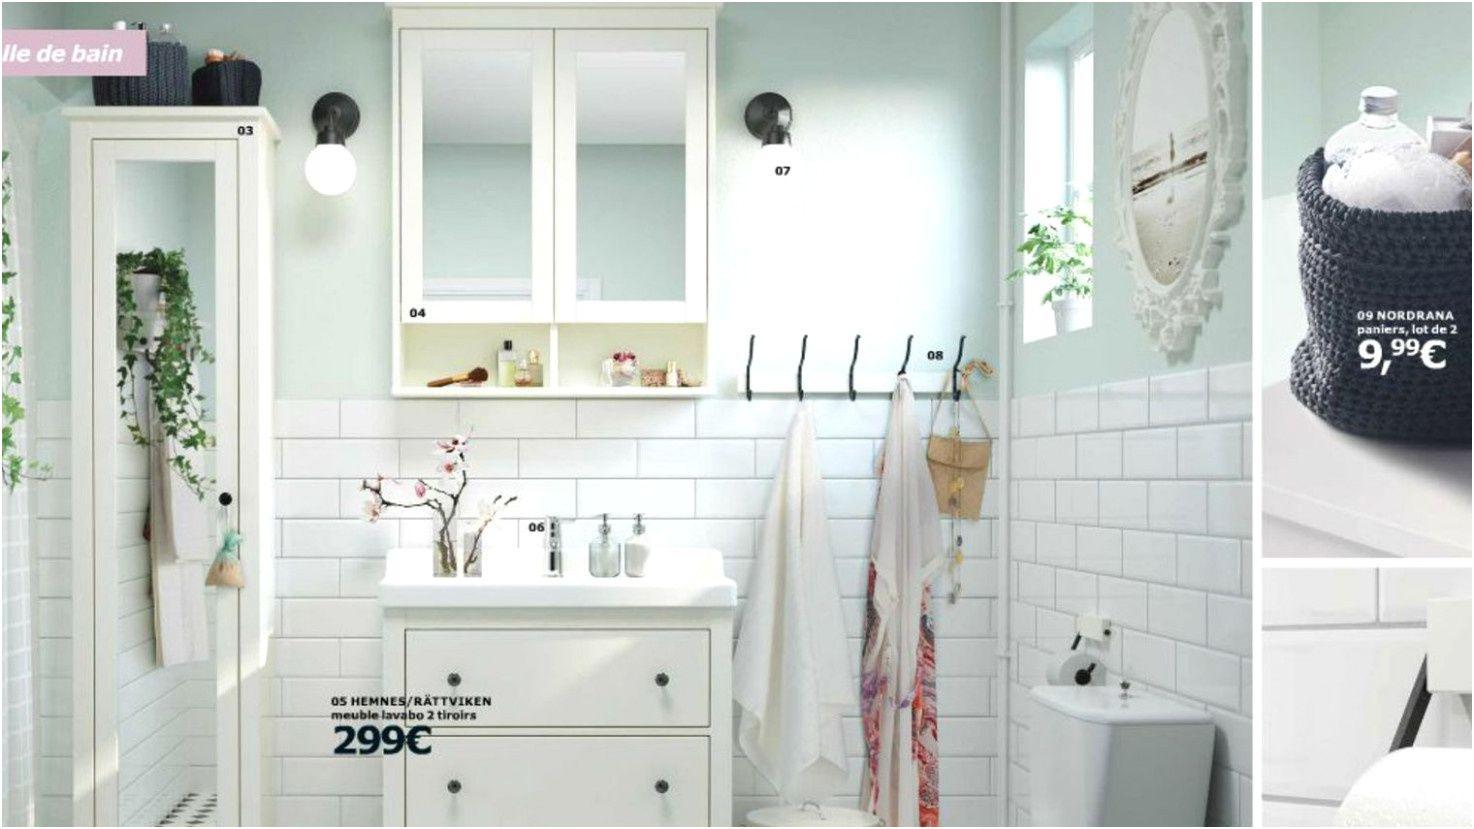 17 Meilleur De Meuble Bain Ikea Gallery In 2020 With Images Vanity New Cars Bathroom Vanity